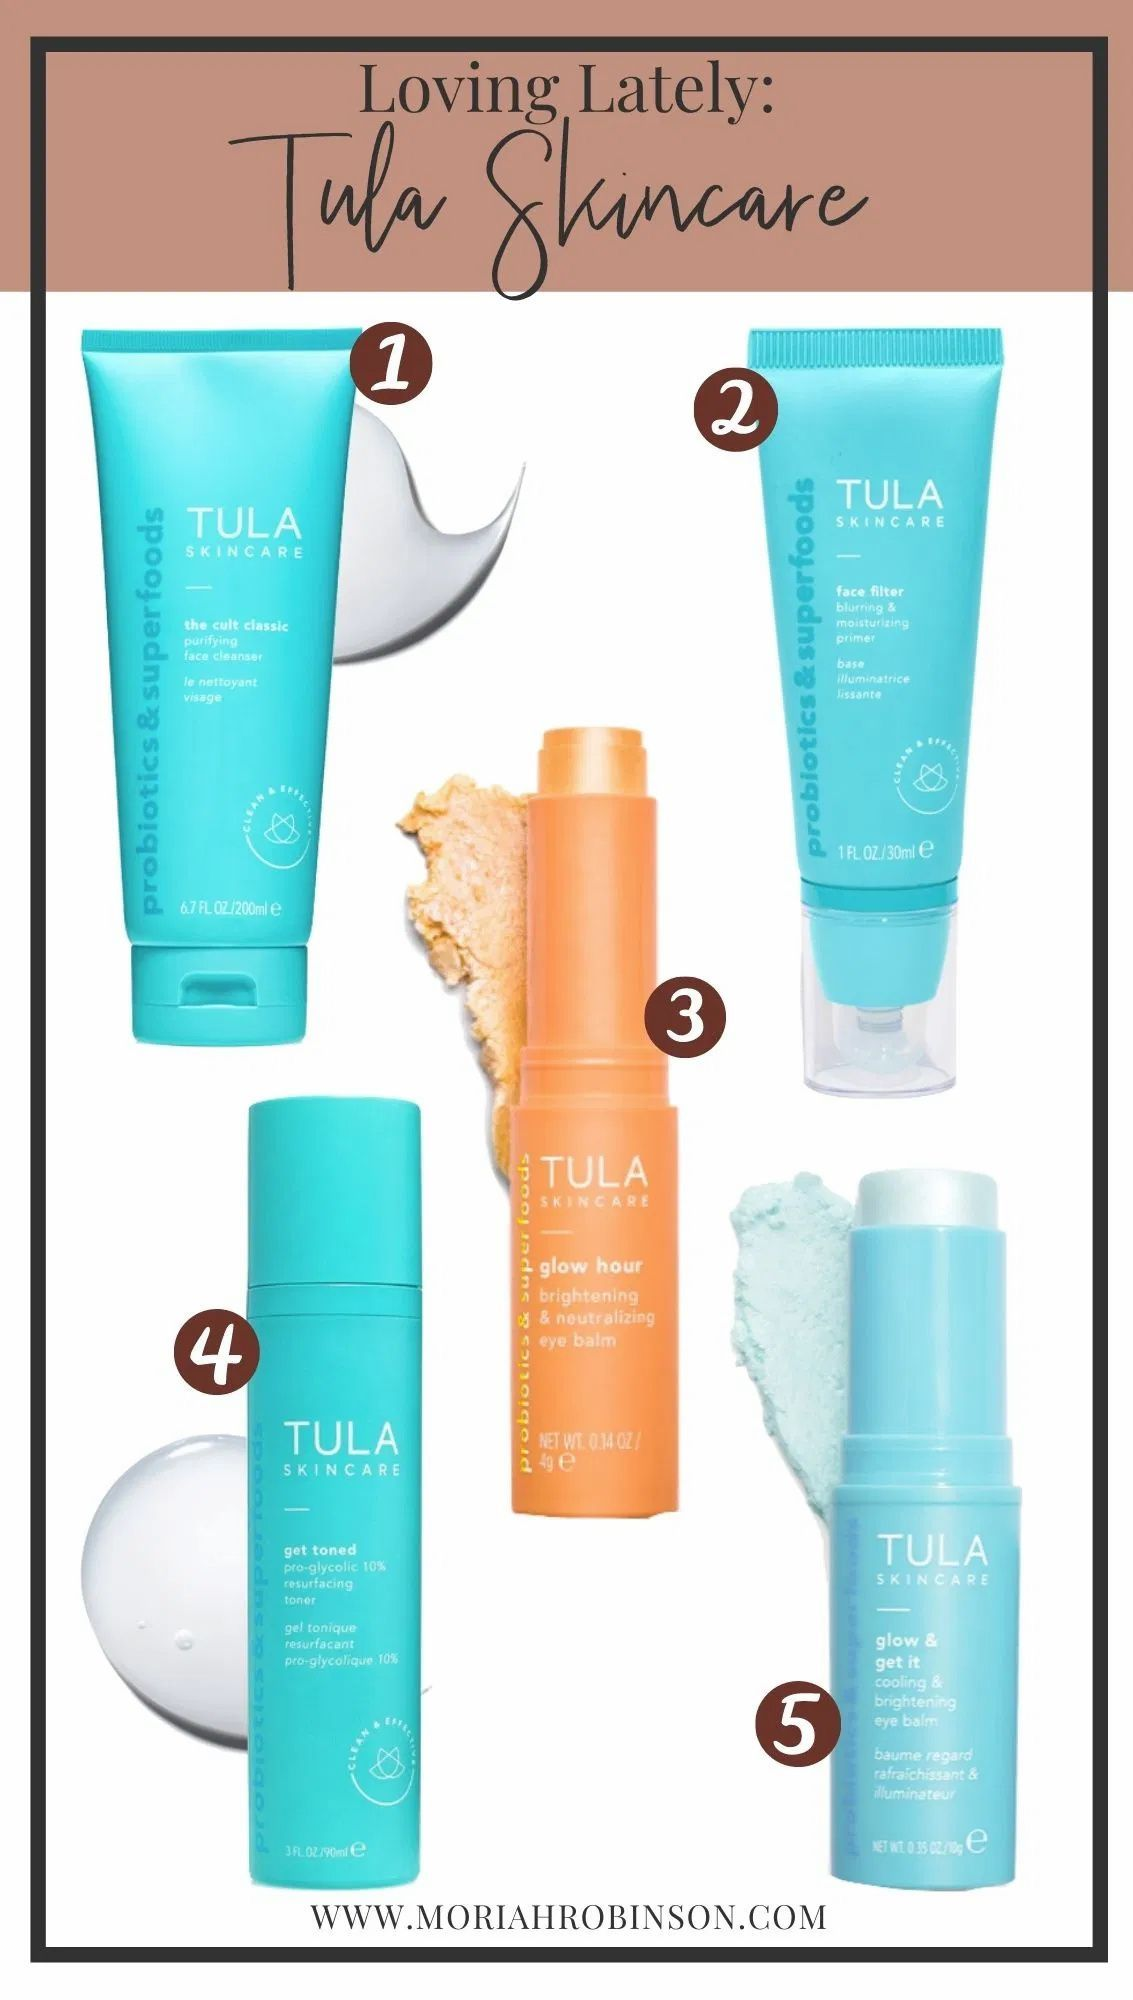 Loving Lately Tula Skincare Moriah Robinson In 2020 Tula Skincare Skin Care Glowing Skincare